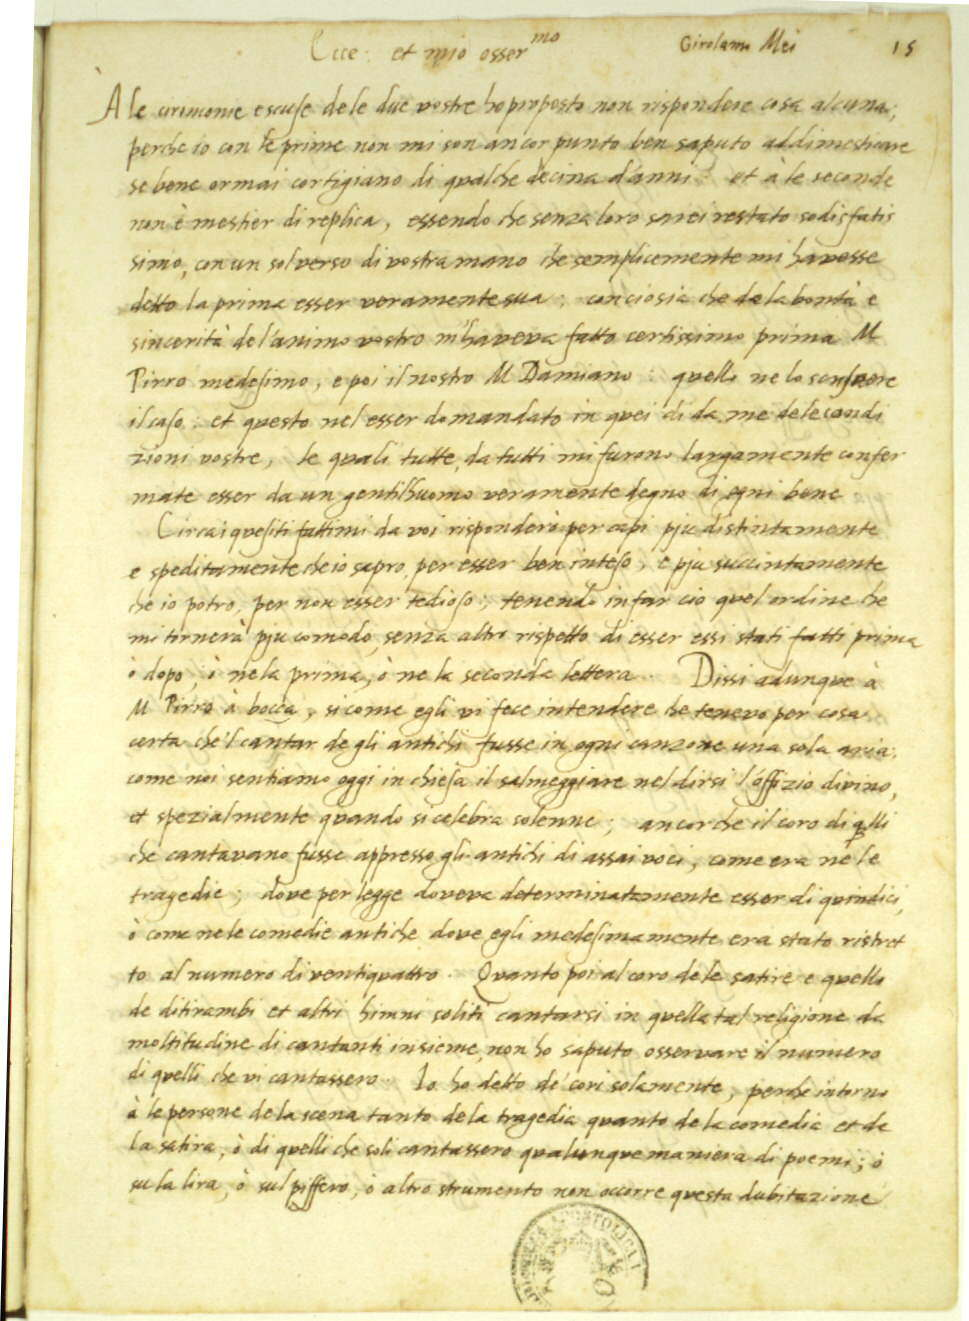 influence of italian opera on instrumental music history essay Antonio vivaldi was a virtuoso violinist,  vivaldi epitomizes italian baroque music like no other composer  no further collections of instrumental music were.